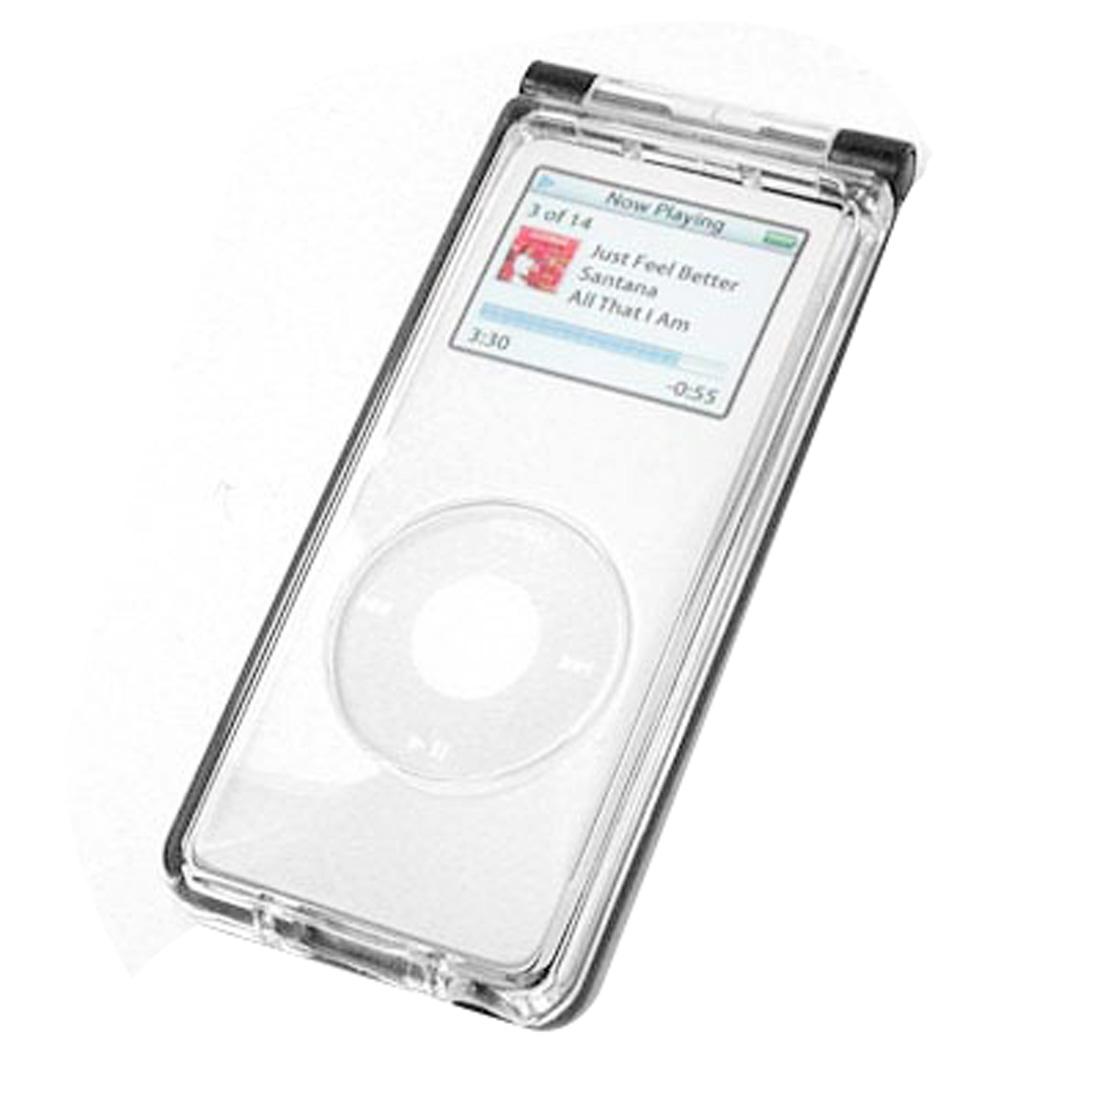 Plastic case - Black for Apple iPod nano 1G